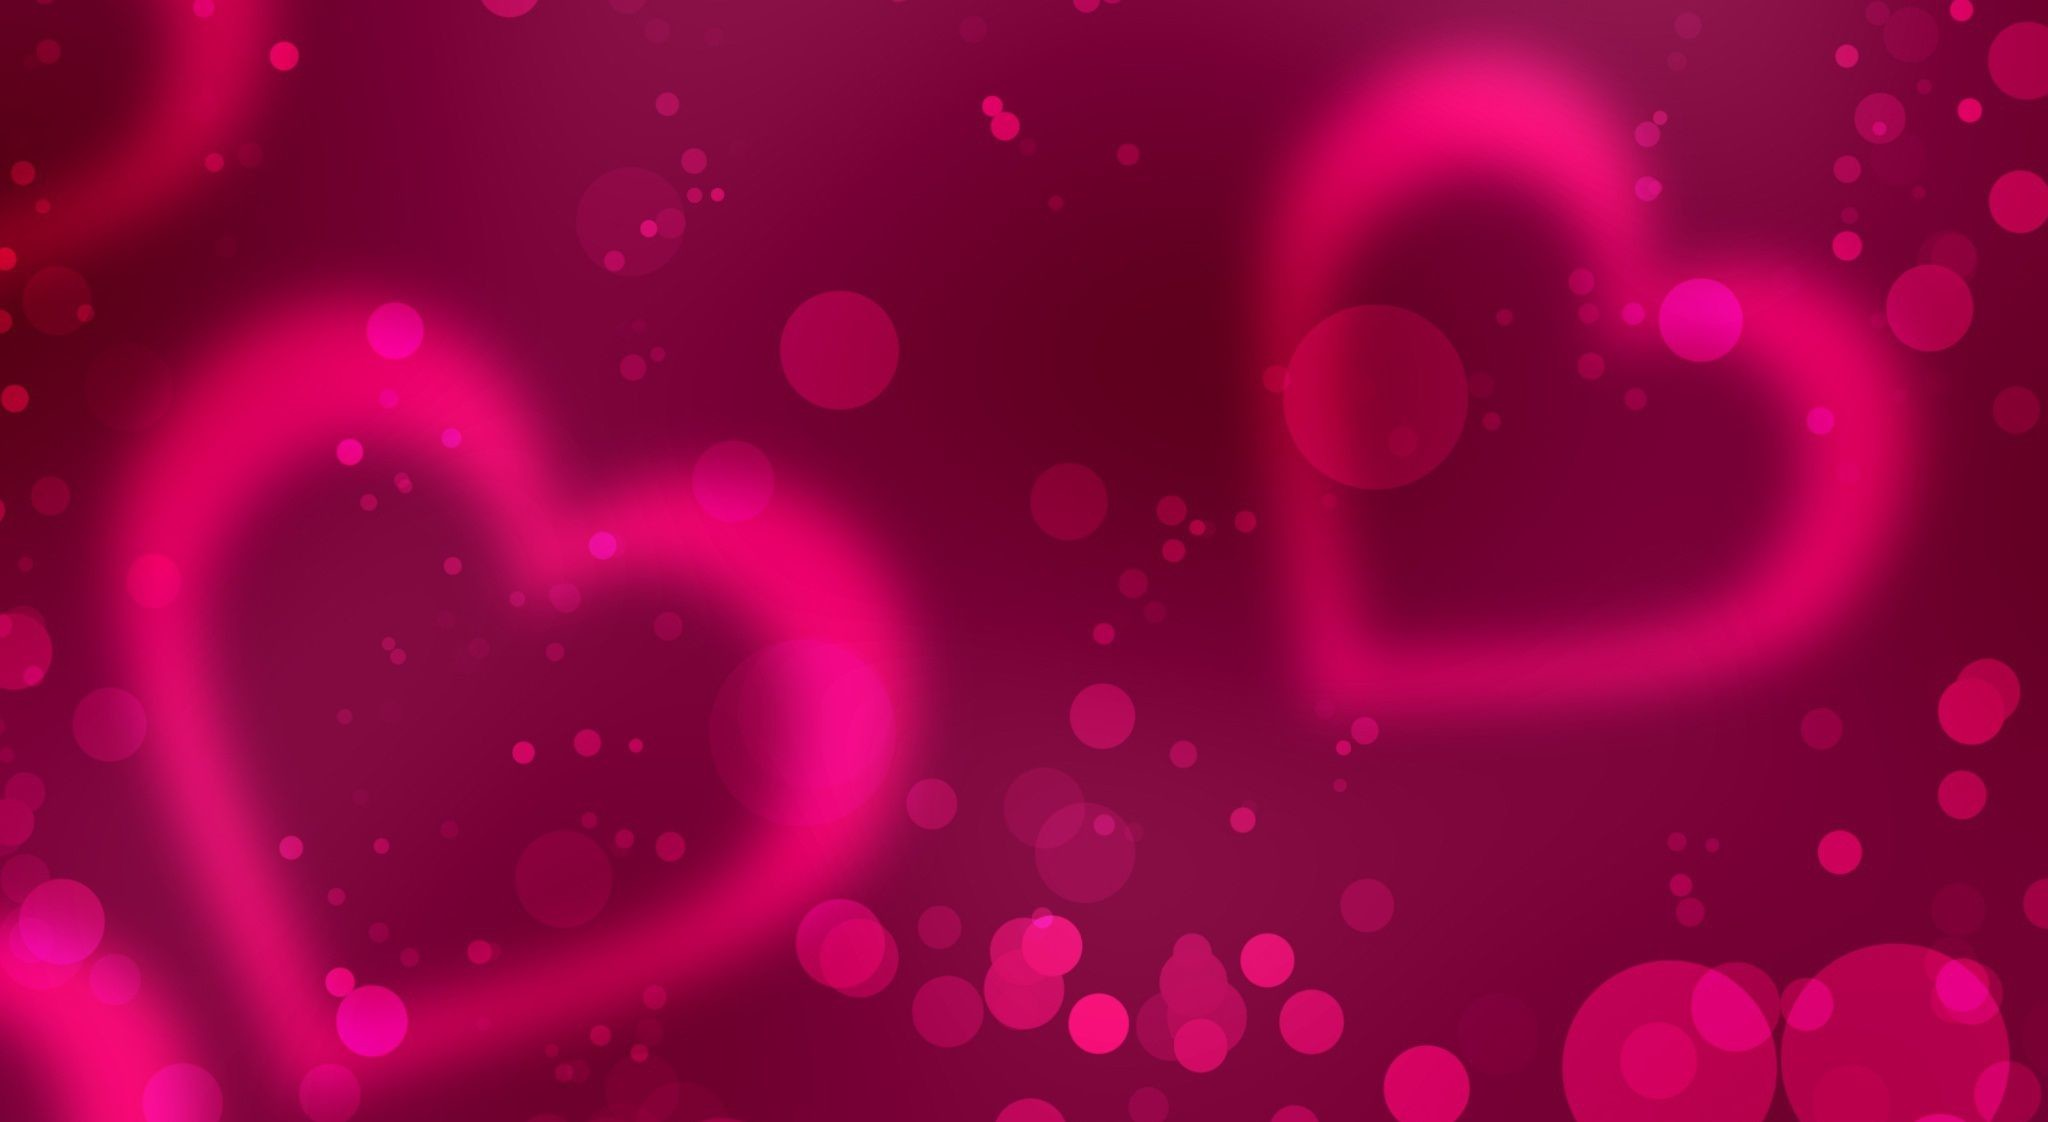 pink heart wallpaper (75+ images)